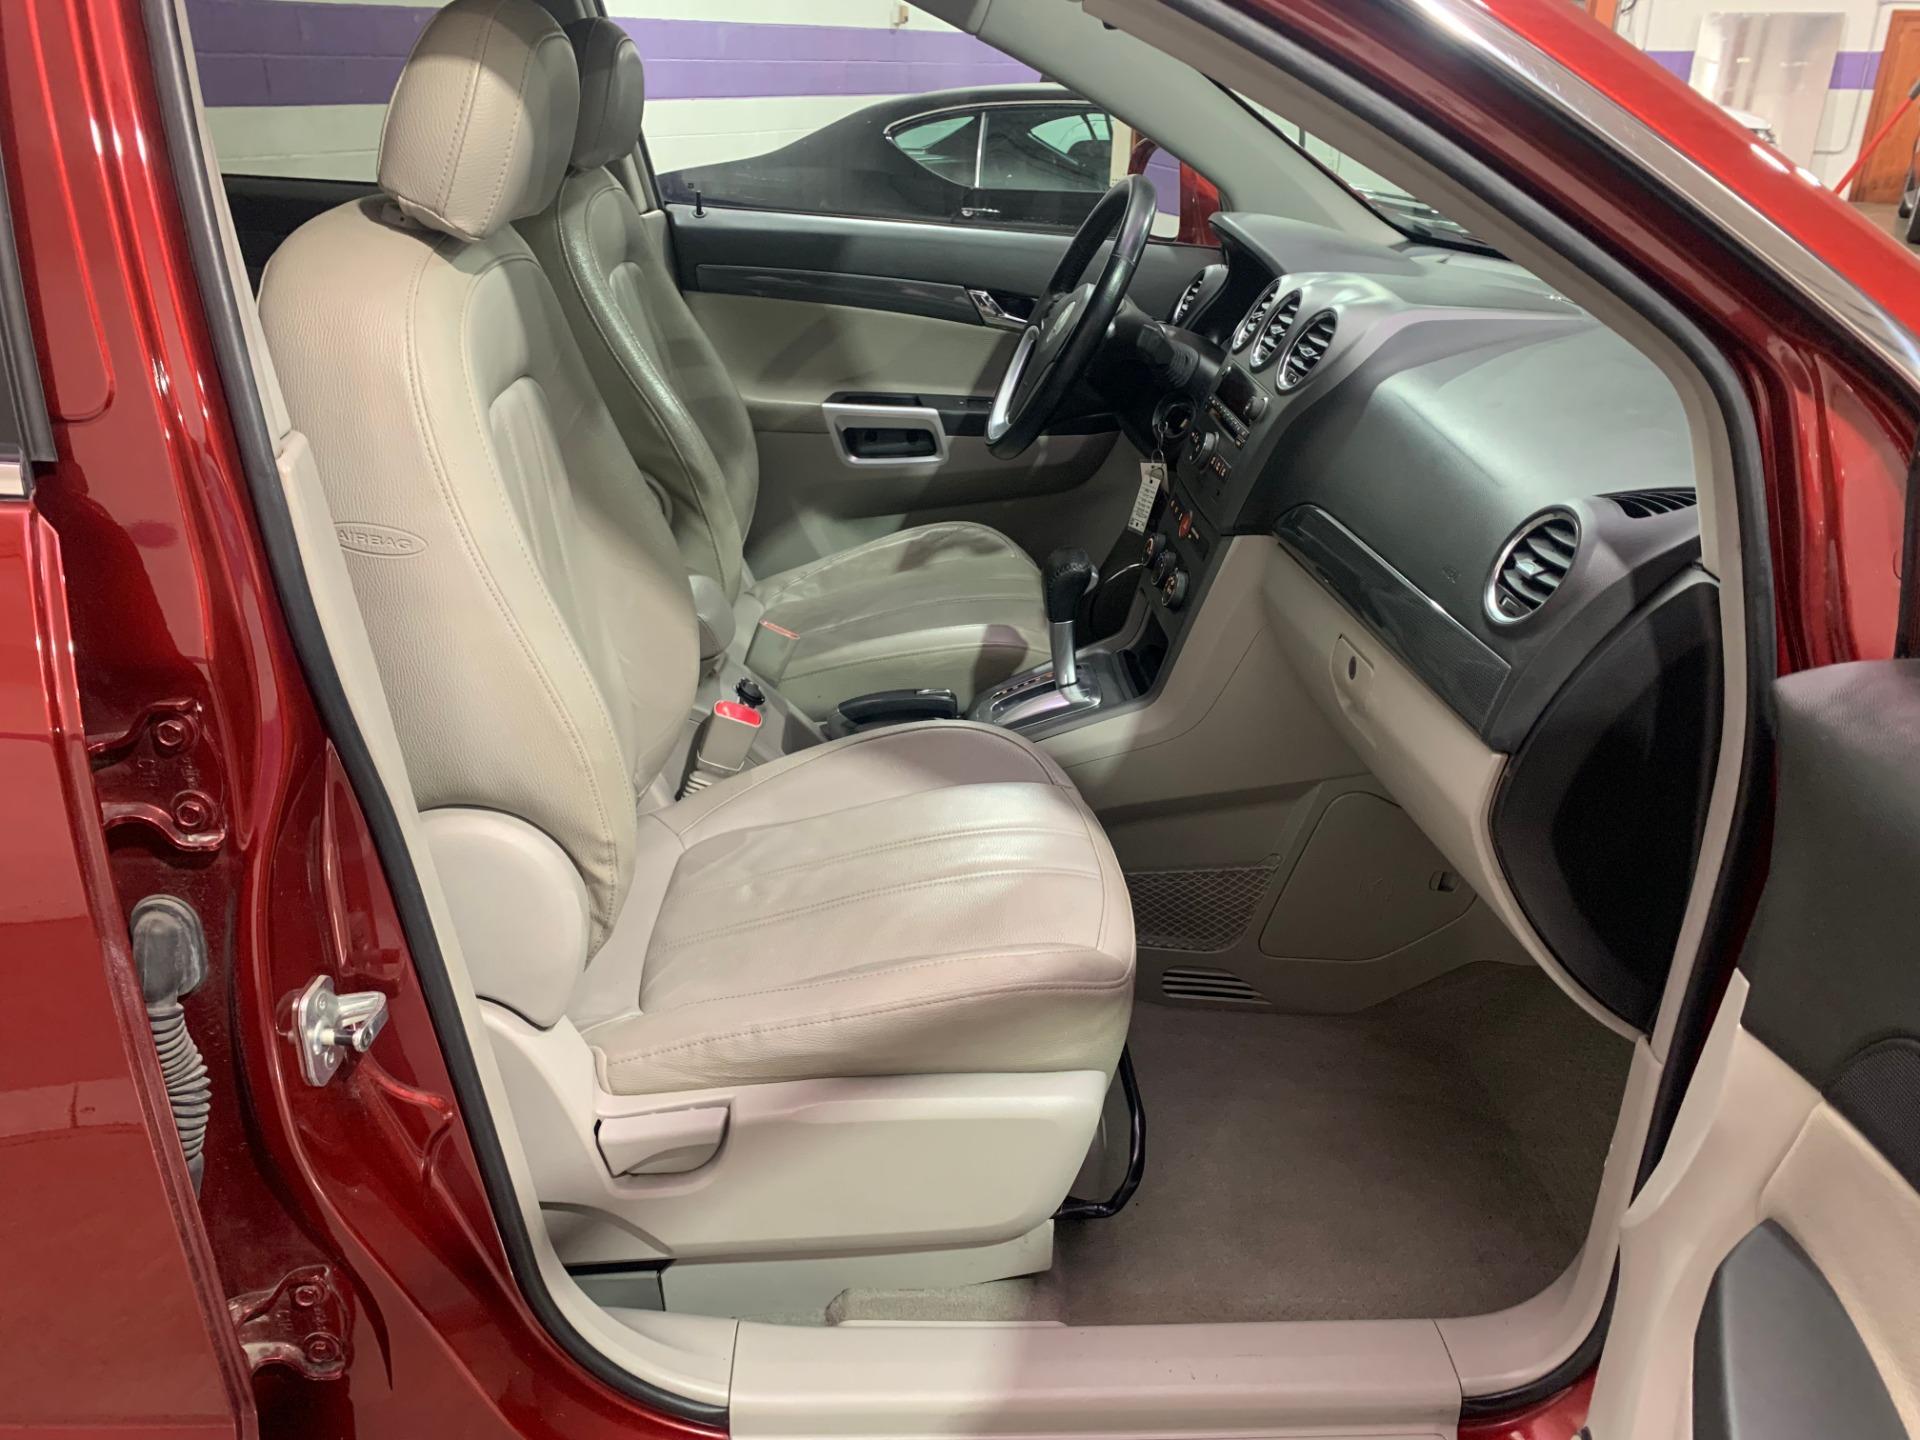 Used-2008-Saturn-Vue-XR-AWD